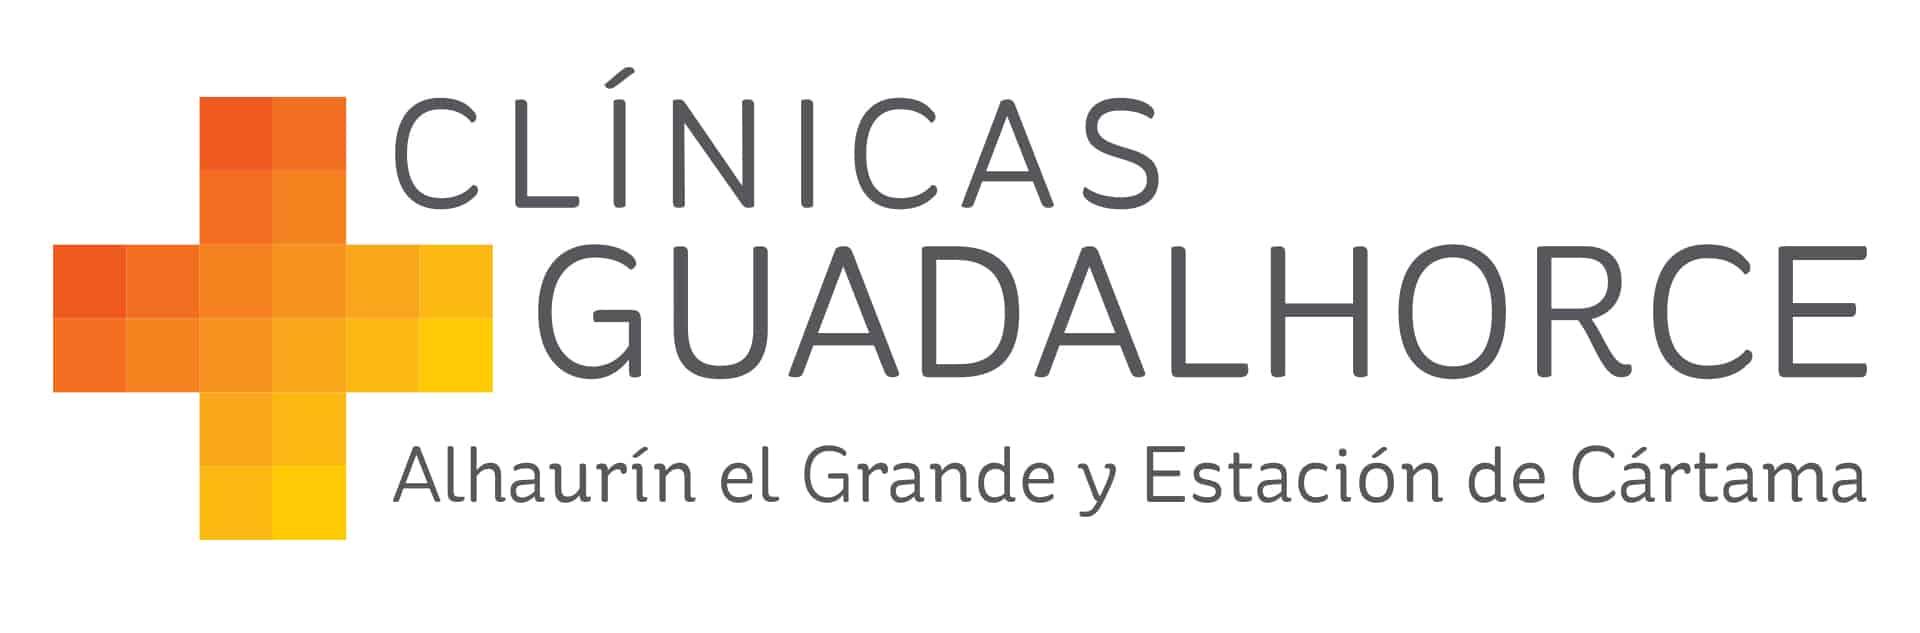 Clinicas Guadalhorce B92418359